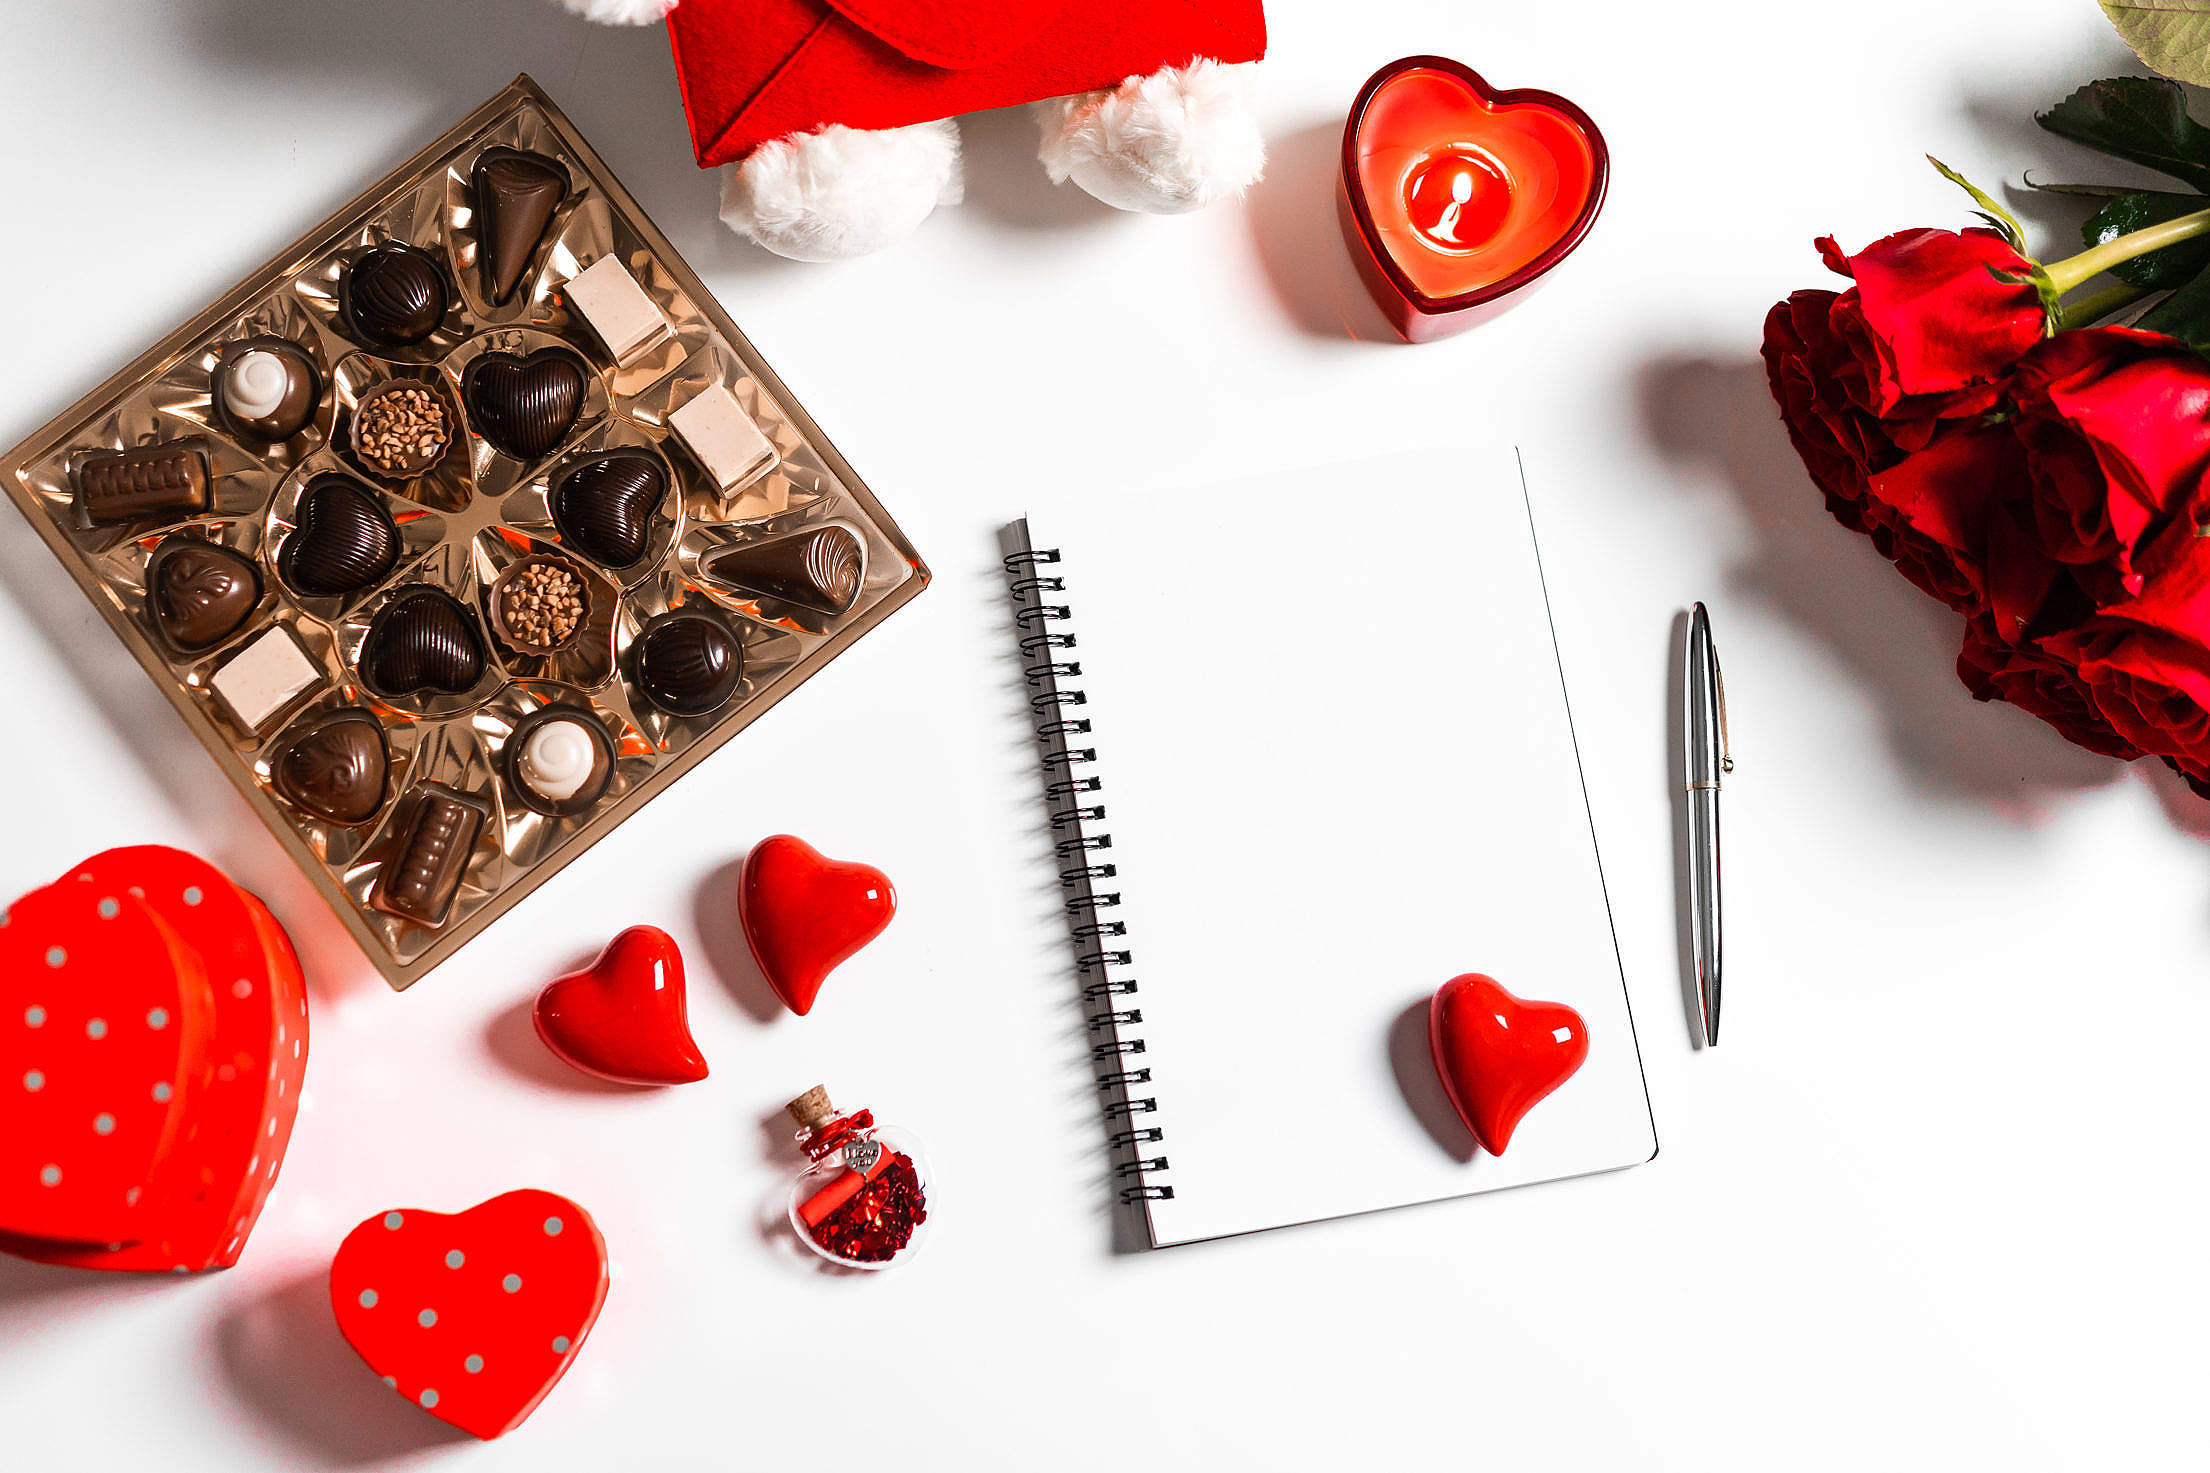 Valentines Day Free Stock Photo